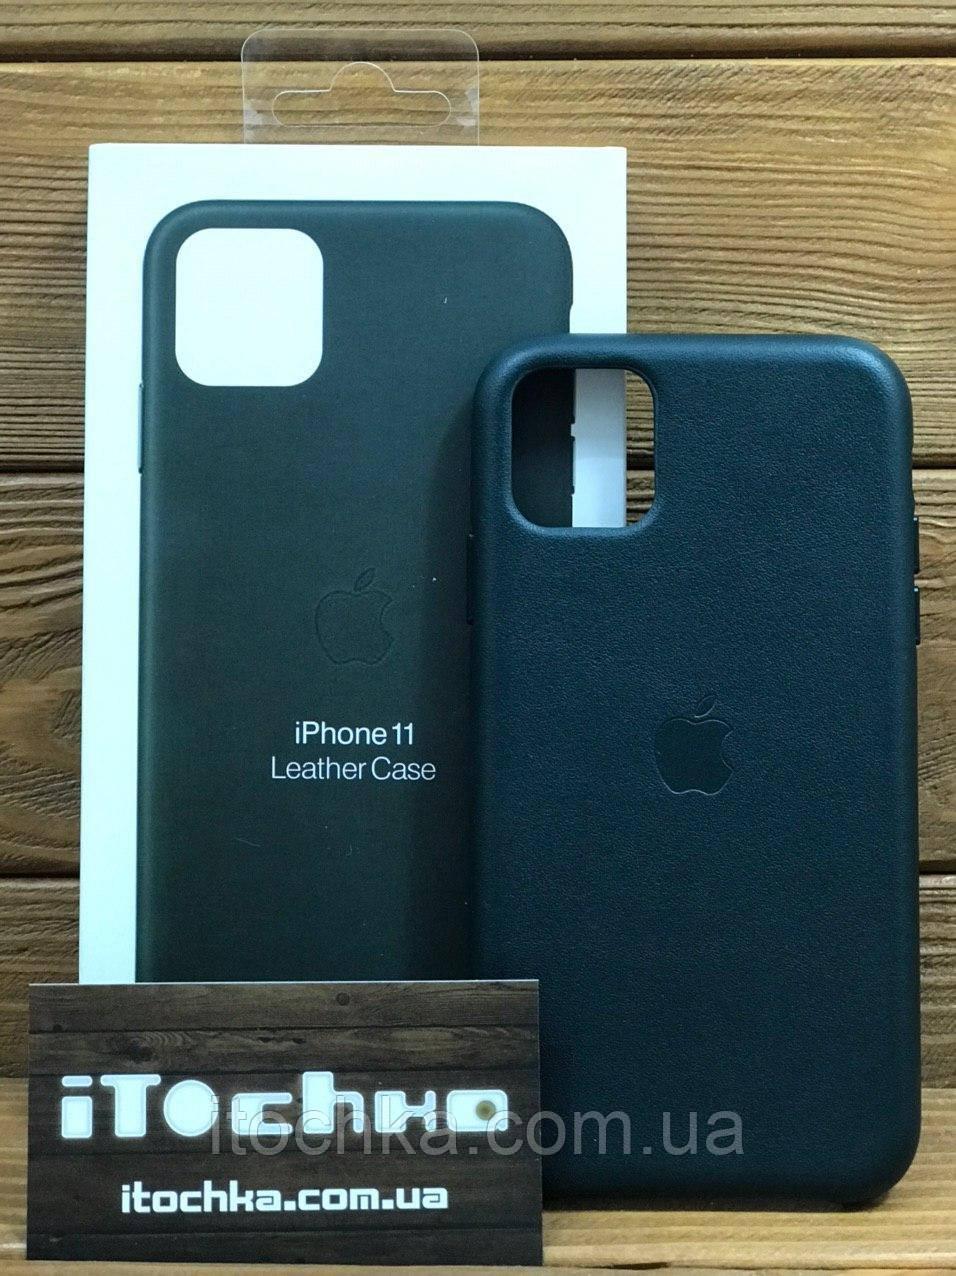 Чехол для iPhone Apple iPhone 11 Leather Case Forest Green